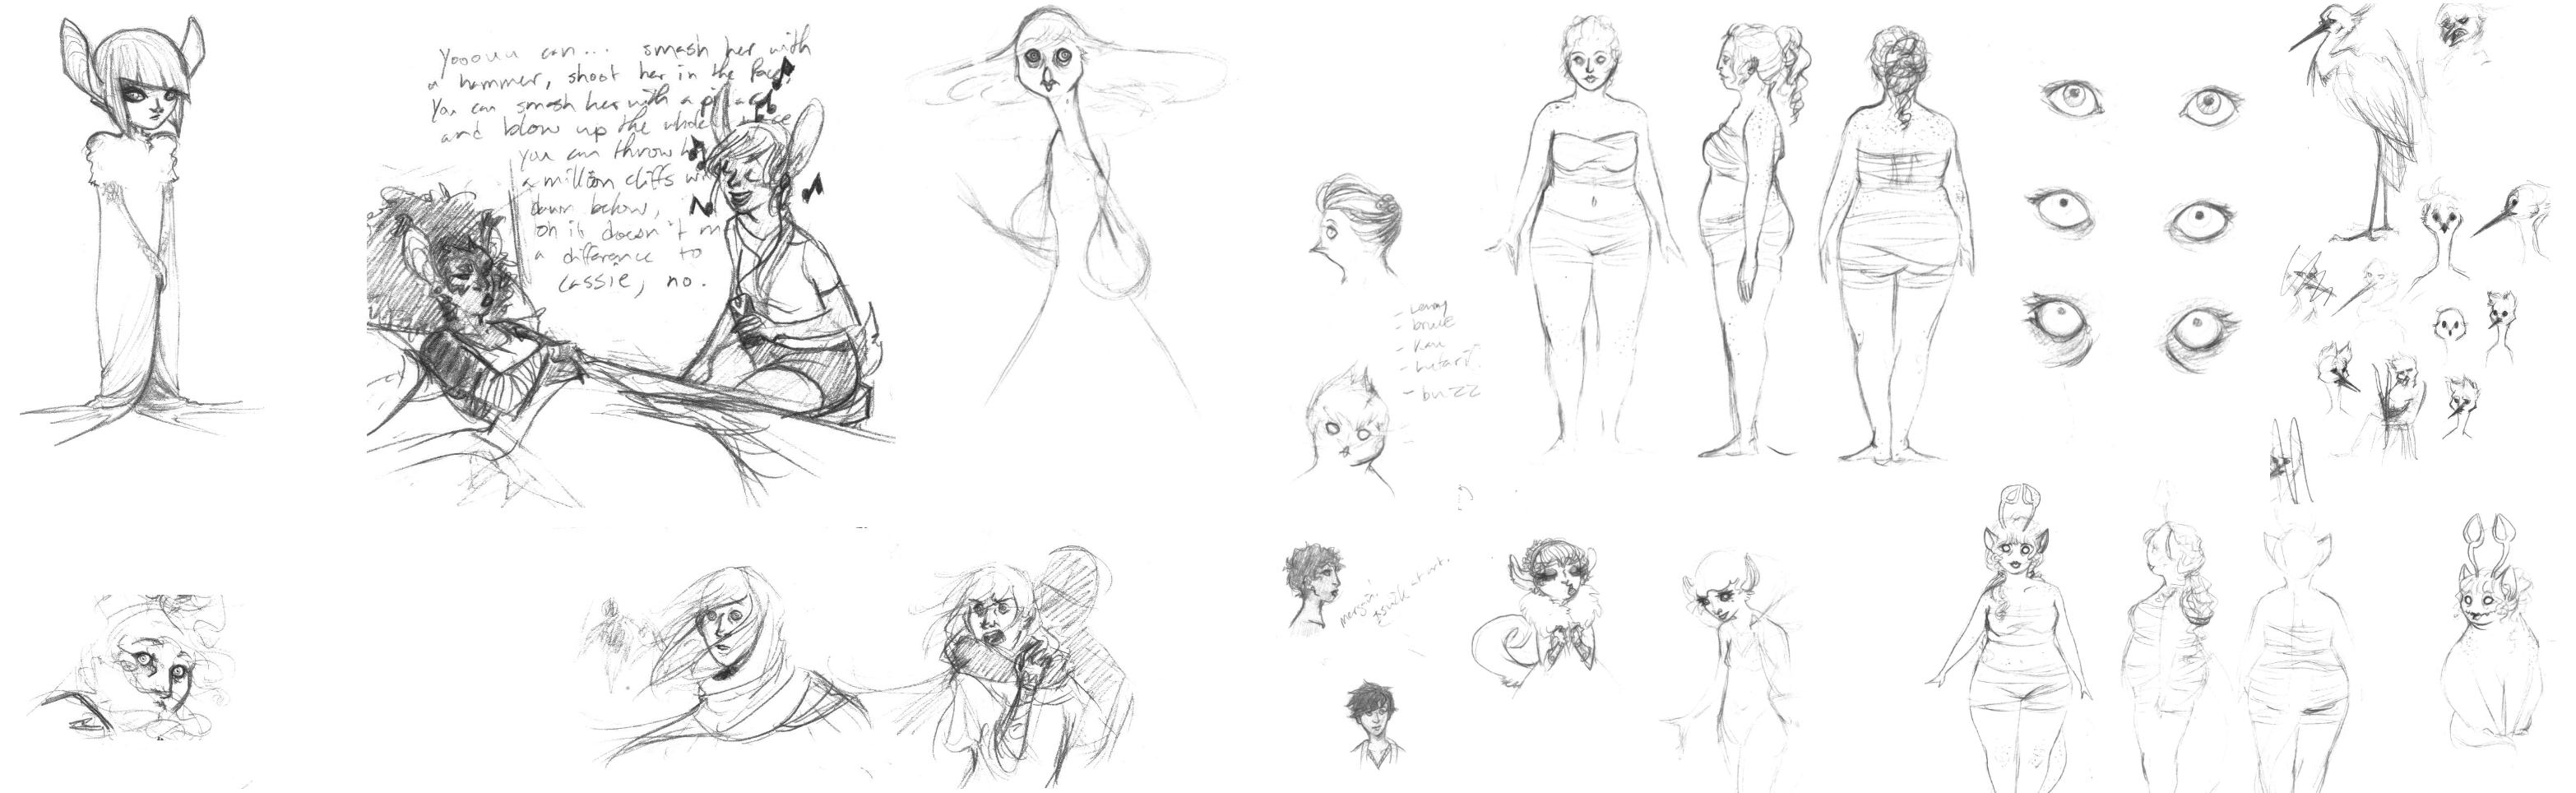 moar sketches!